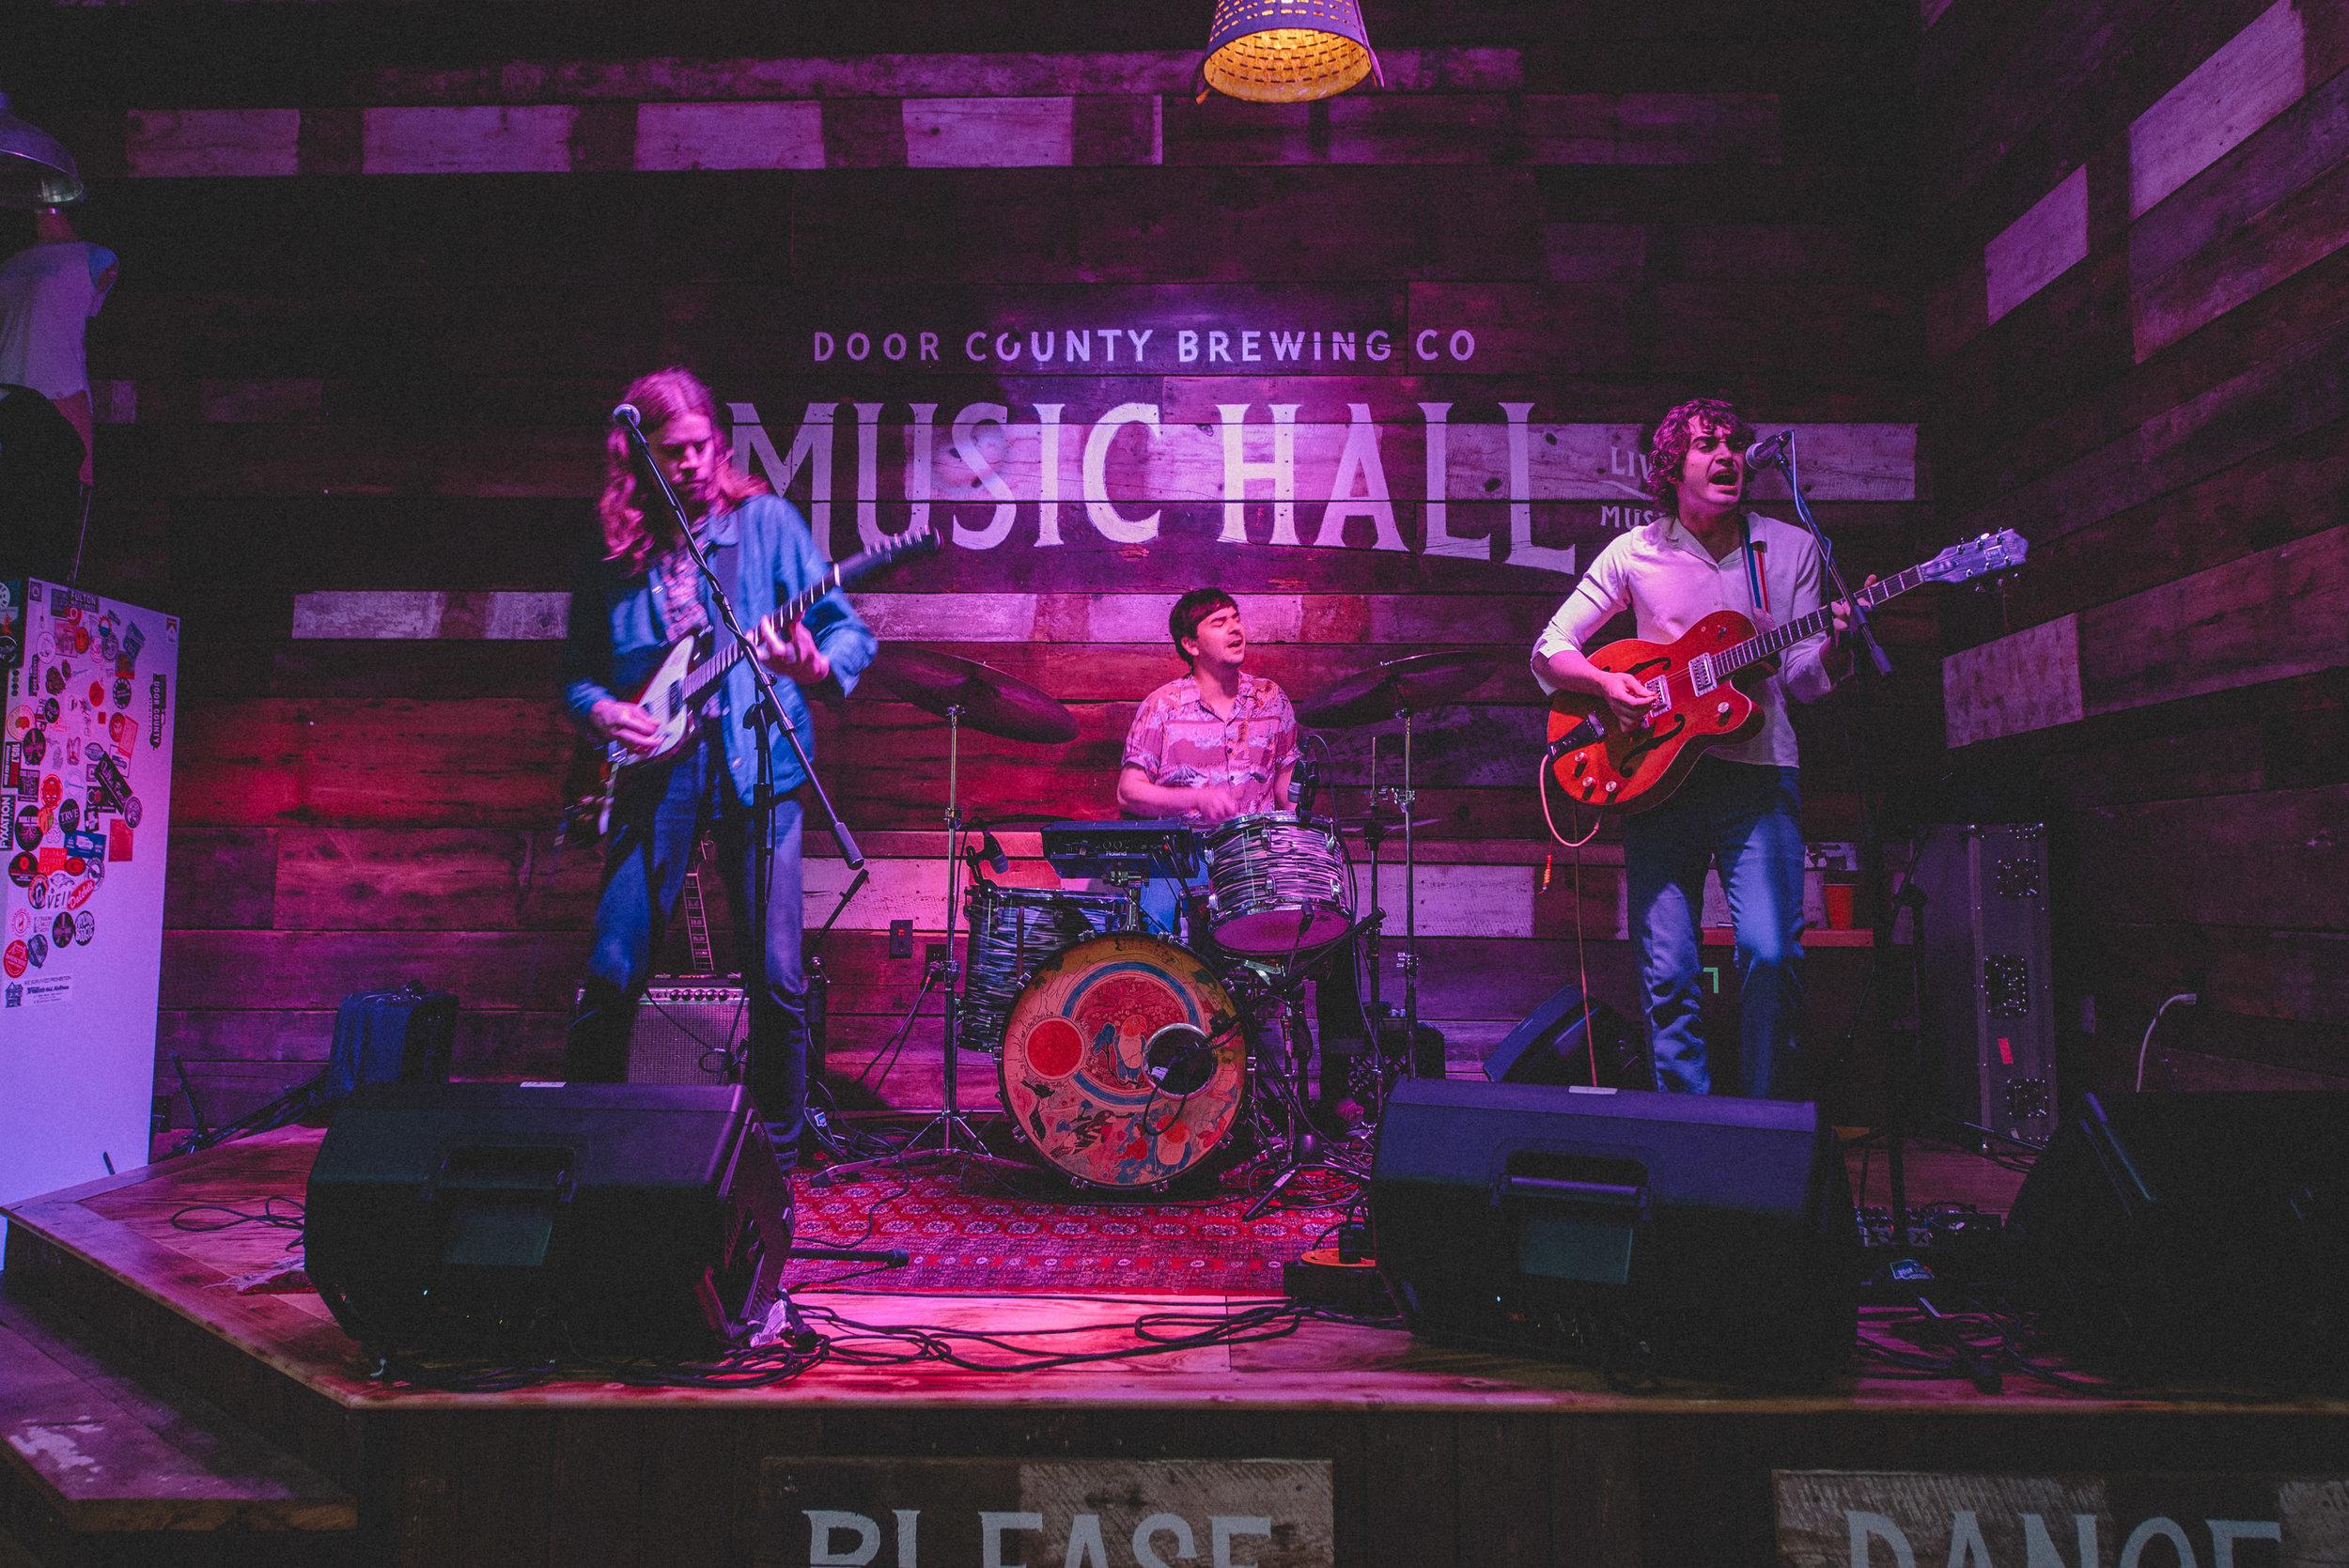 Night-Moves-Door-County-Brewing-Co-Music-Hall-8.jpg